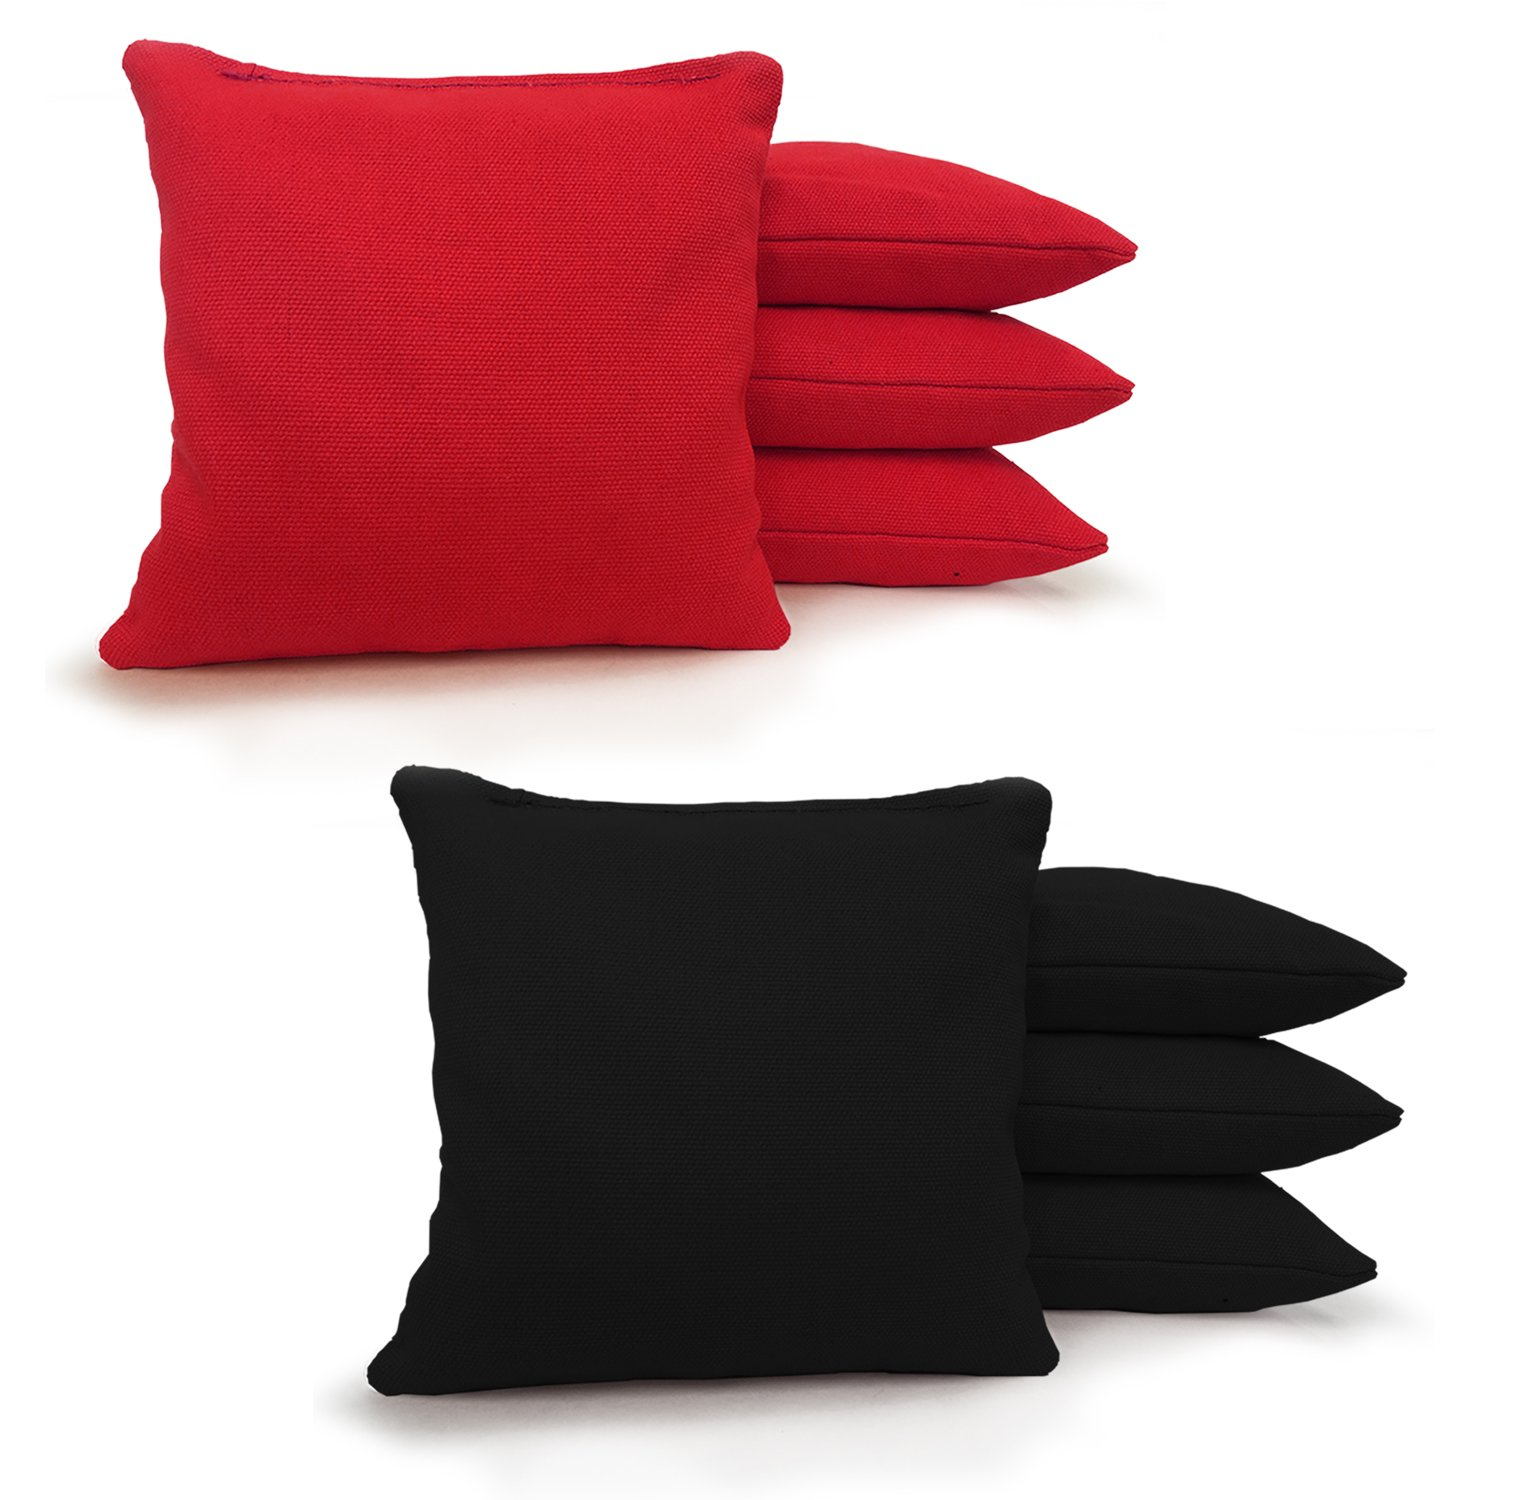 8 Standard Corn Filled Regulation 6''x6'' Duck Cloth Cornhole Bags! (Black/Red)